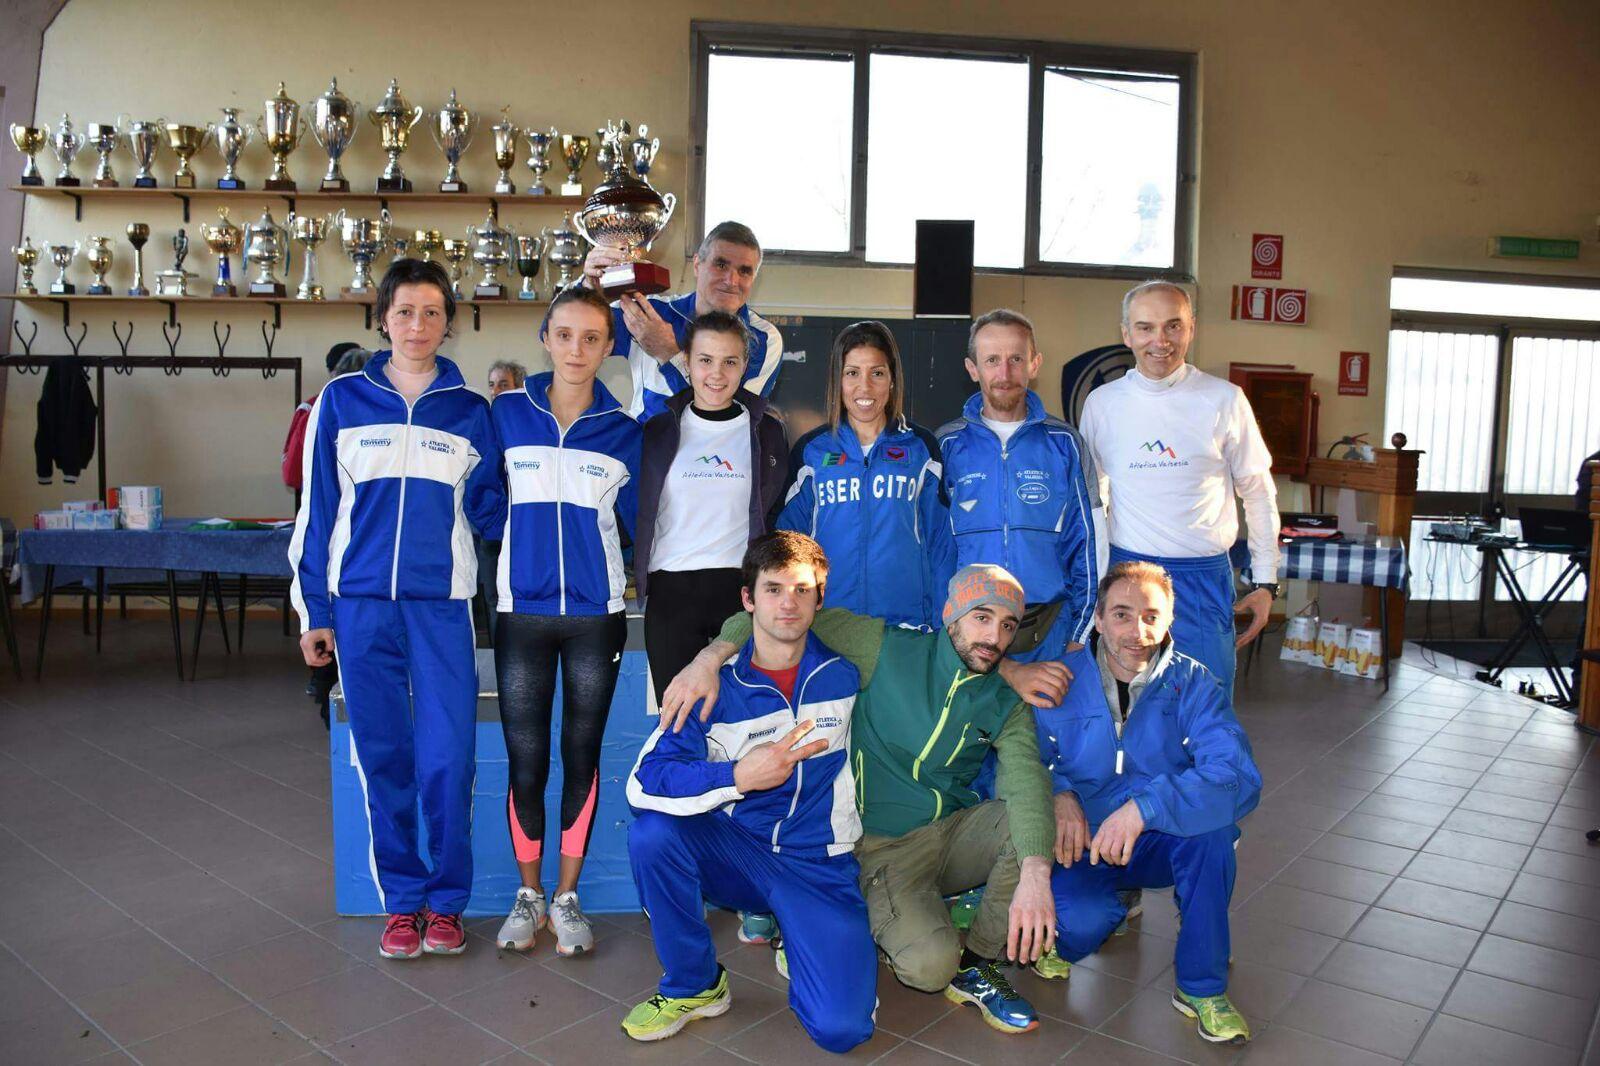 2017.02.25 Verrone Atletica Valsesia